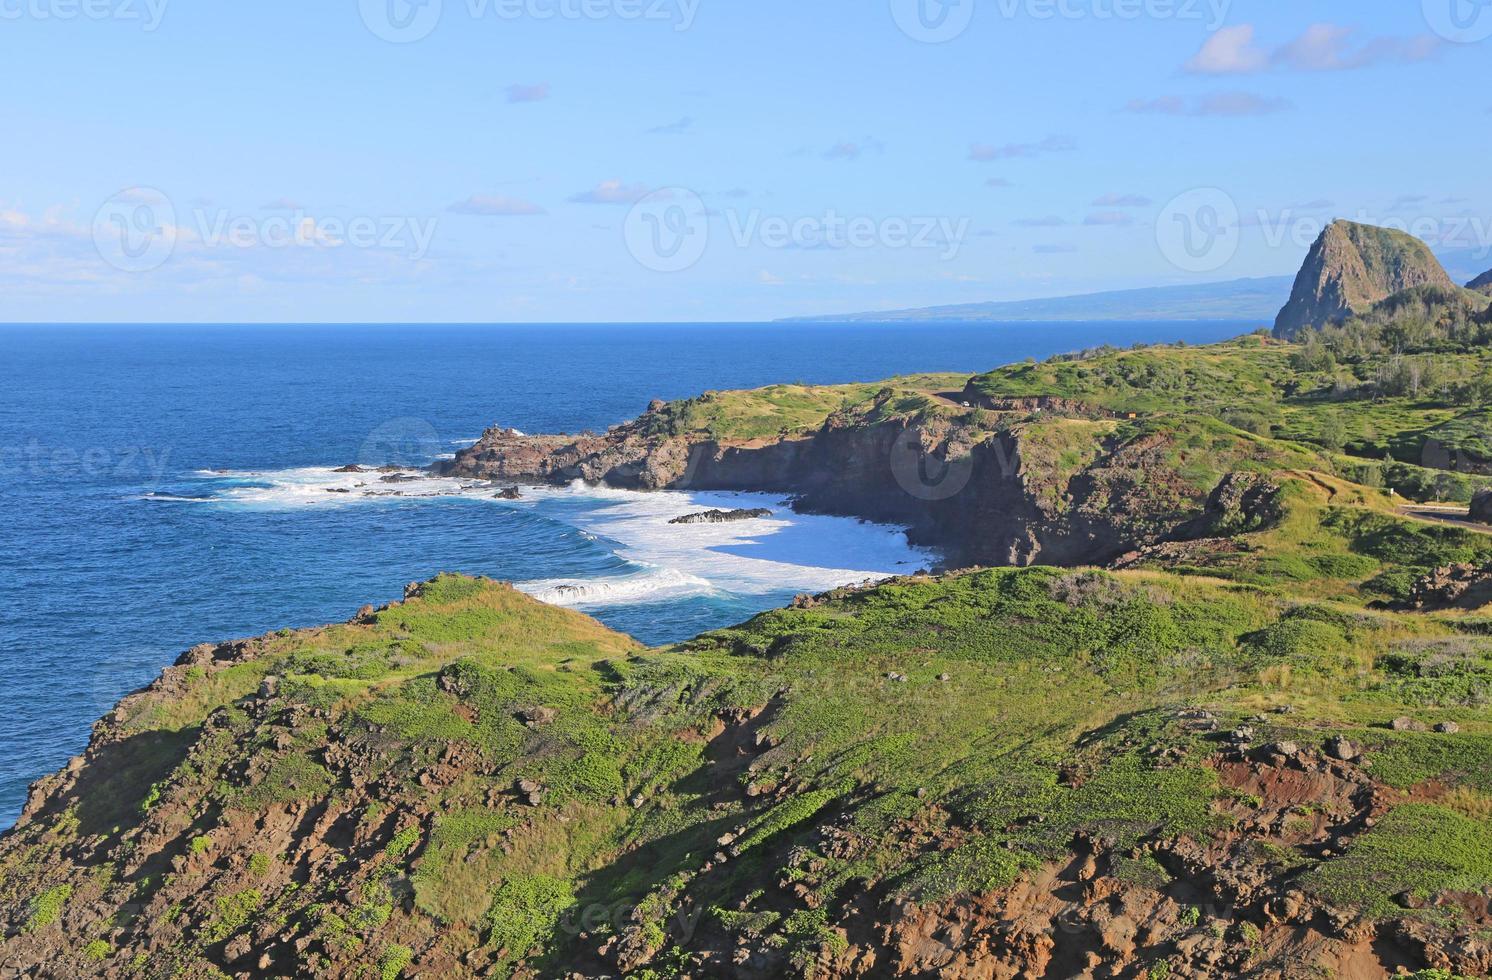 Küste von Maui mit Kahakuloa-Kopf foto